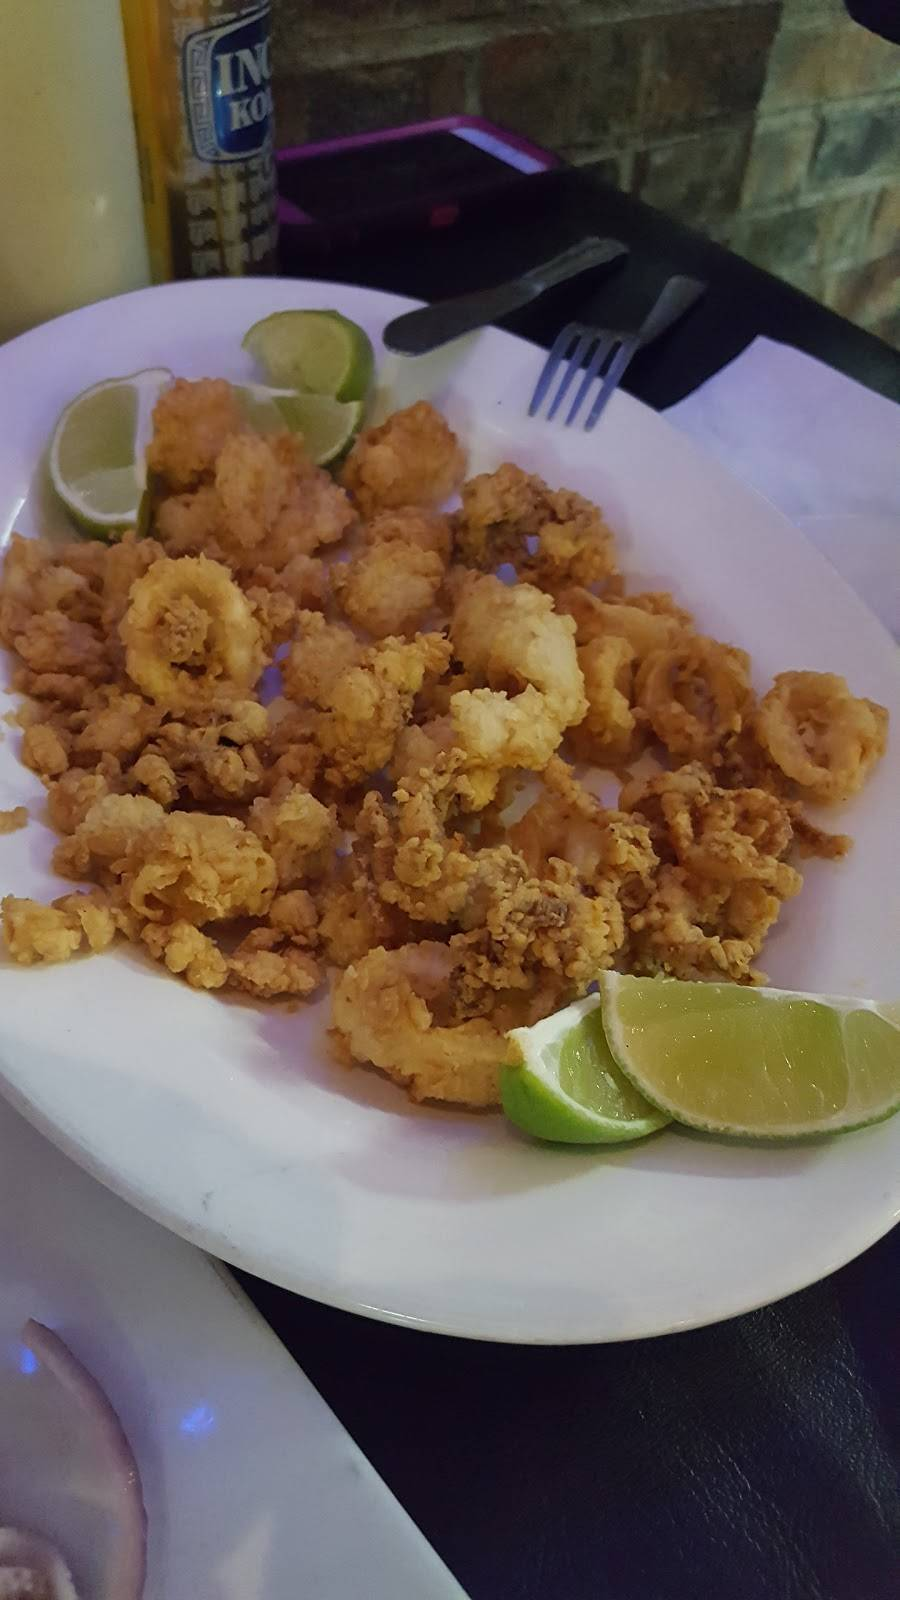 Cevicheria El Rey   restaurant   85-16 Roosevelt Ave, Jackson Heights, NY 11372, USA   3478379180 OR +1 347-837-9180